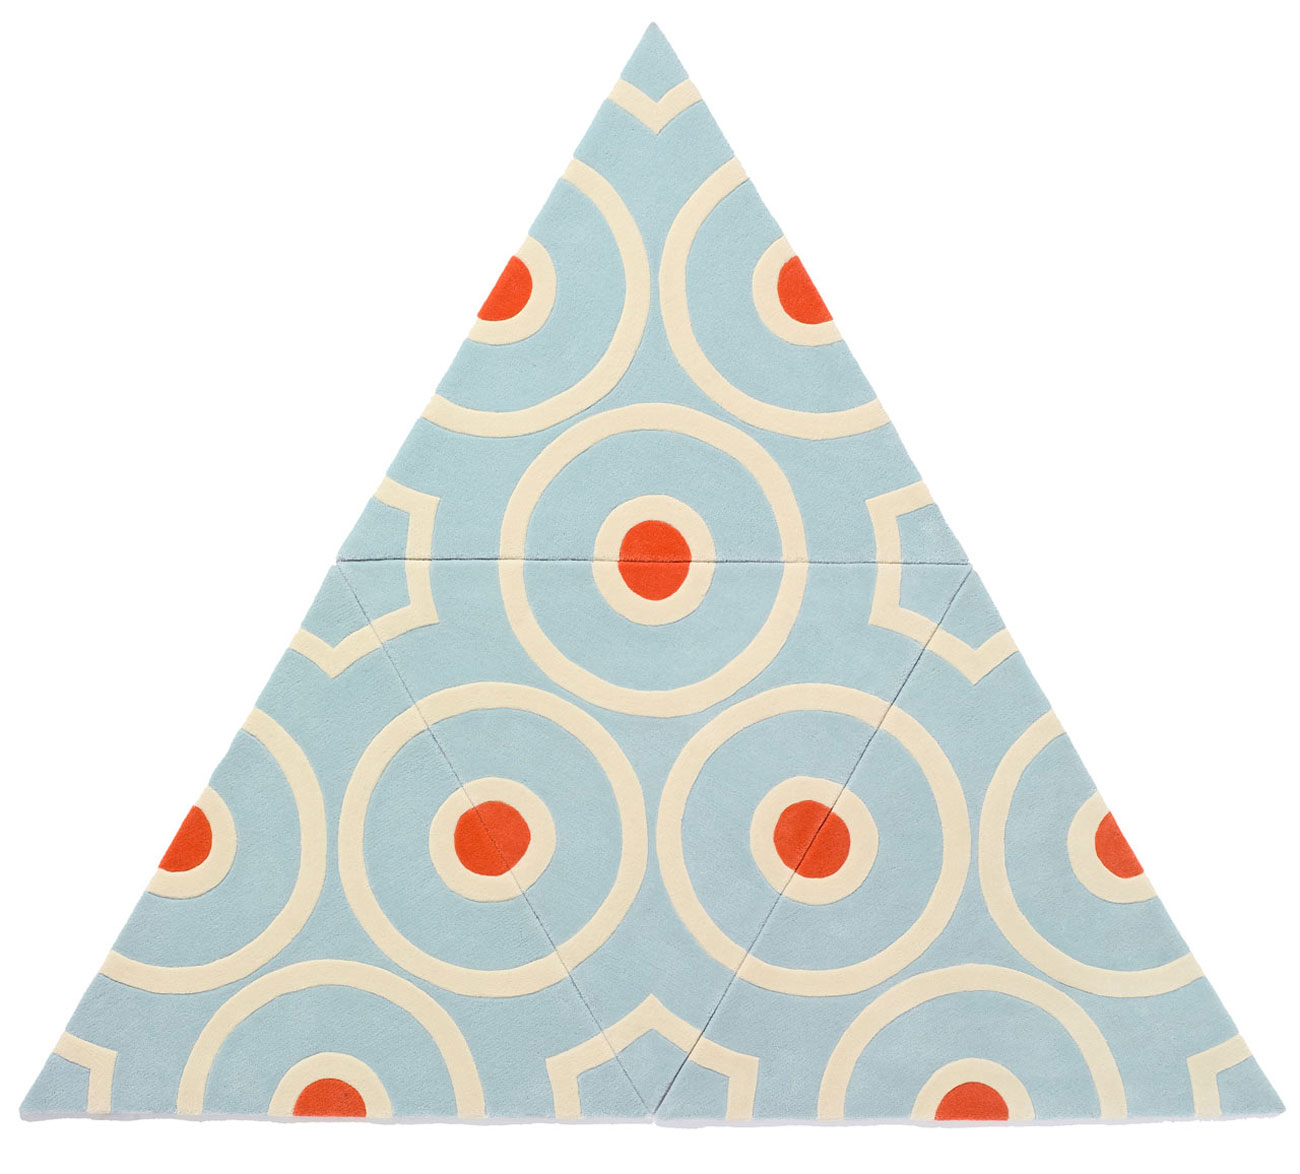 kinder ground modular carpet triangle